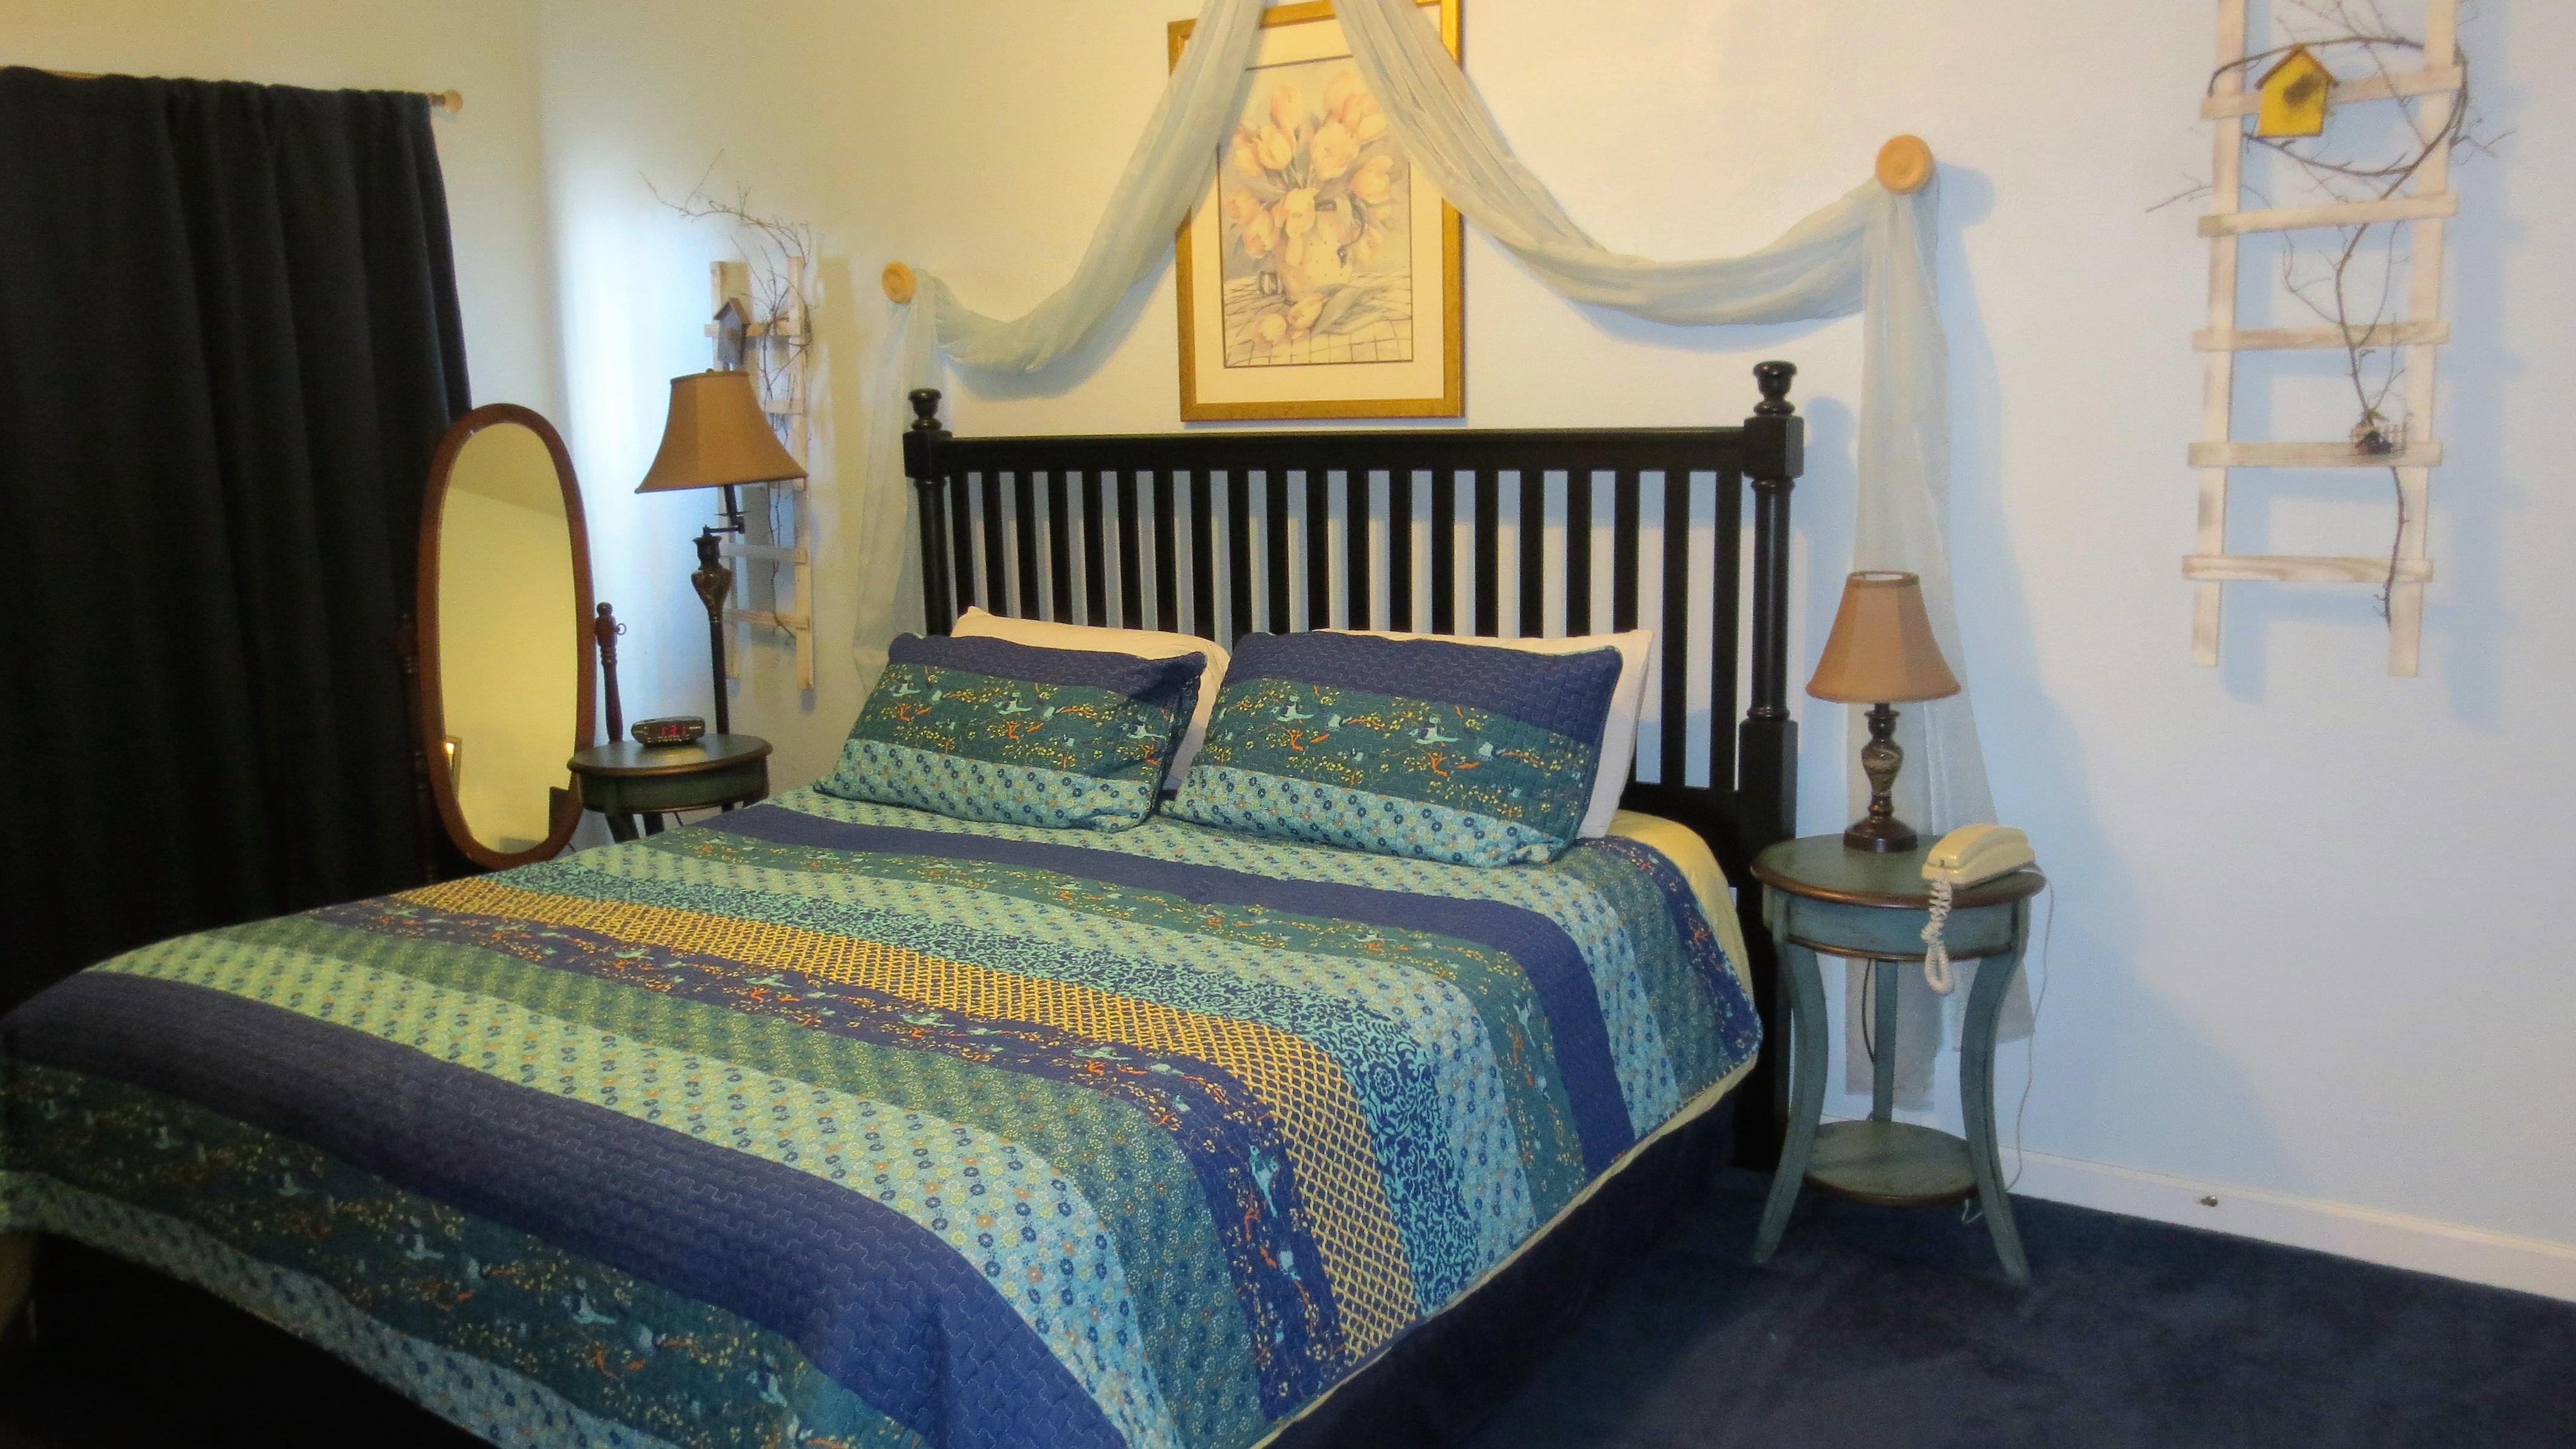 50 birdhouse inn 4 bedroom 4 bath chalet in gatlinburg master bedroom with king bed